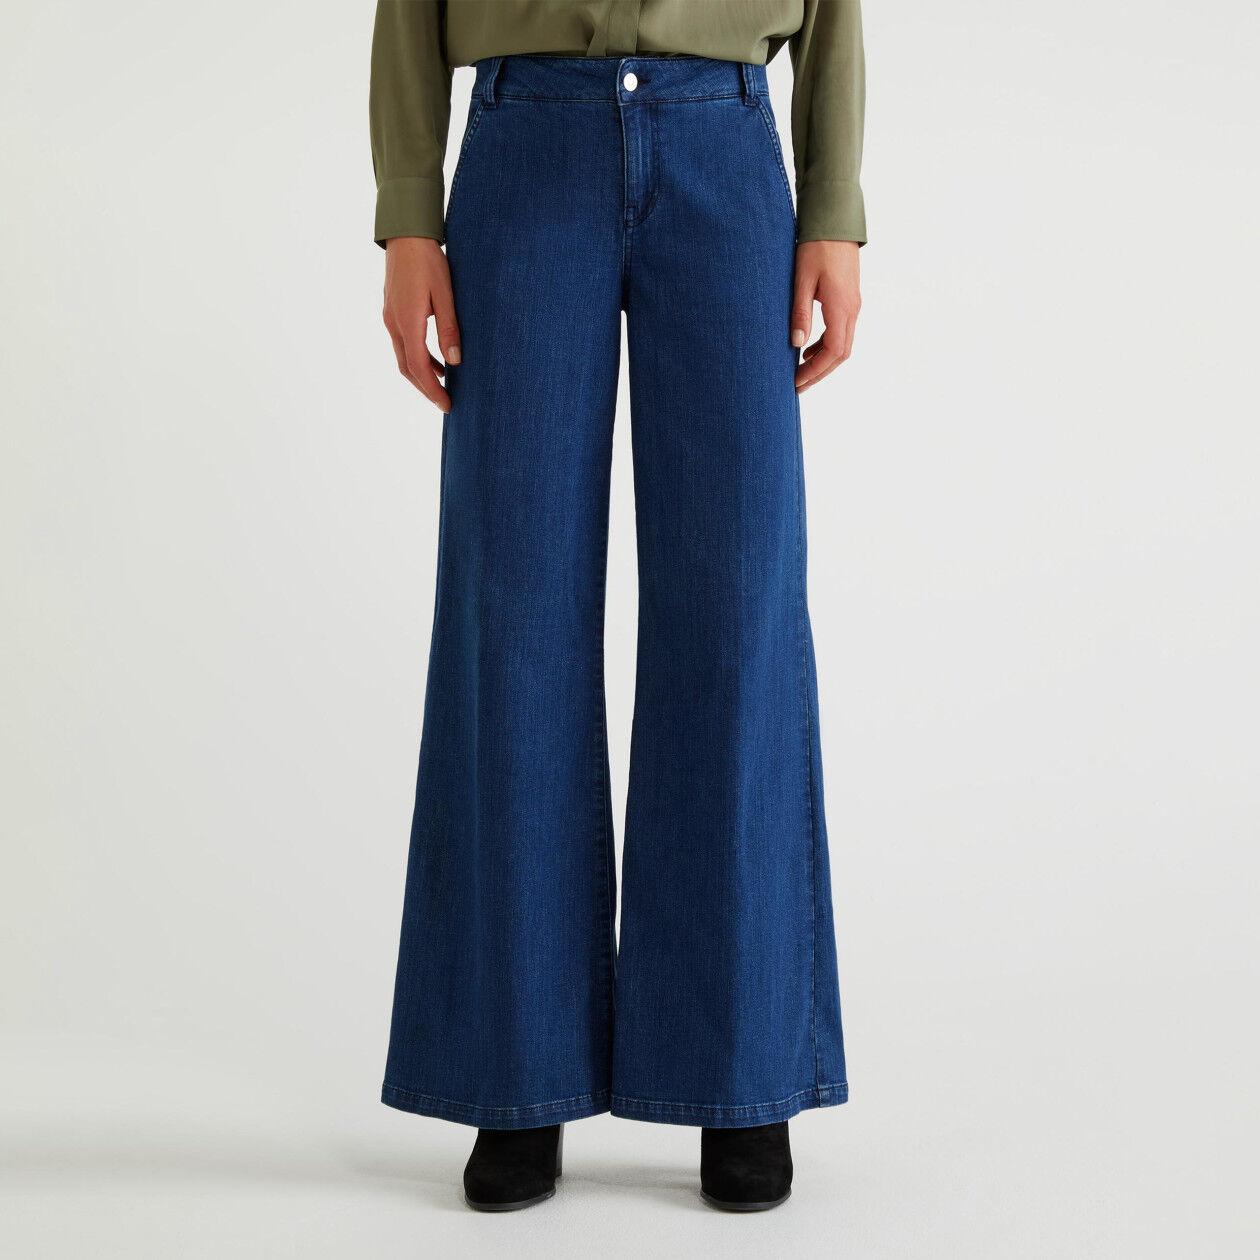 Flared denim trousers